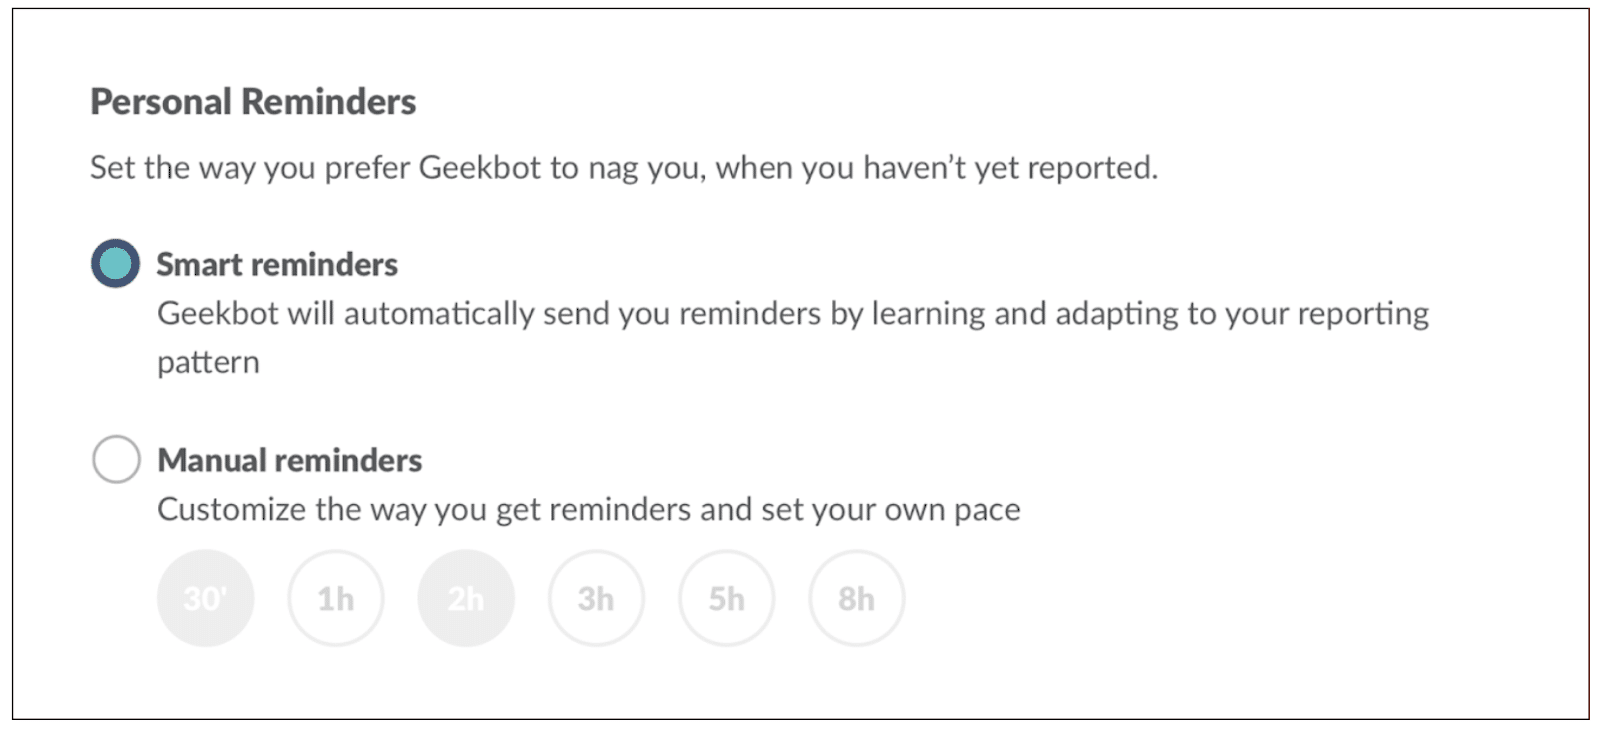 Personal reminders: You can setup Smart reminders or Manual reminders.